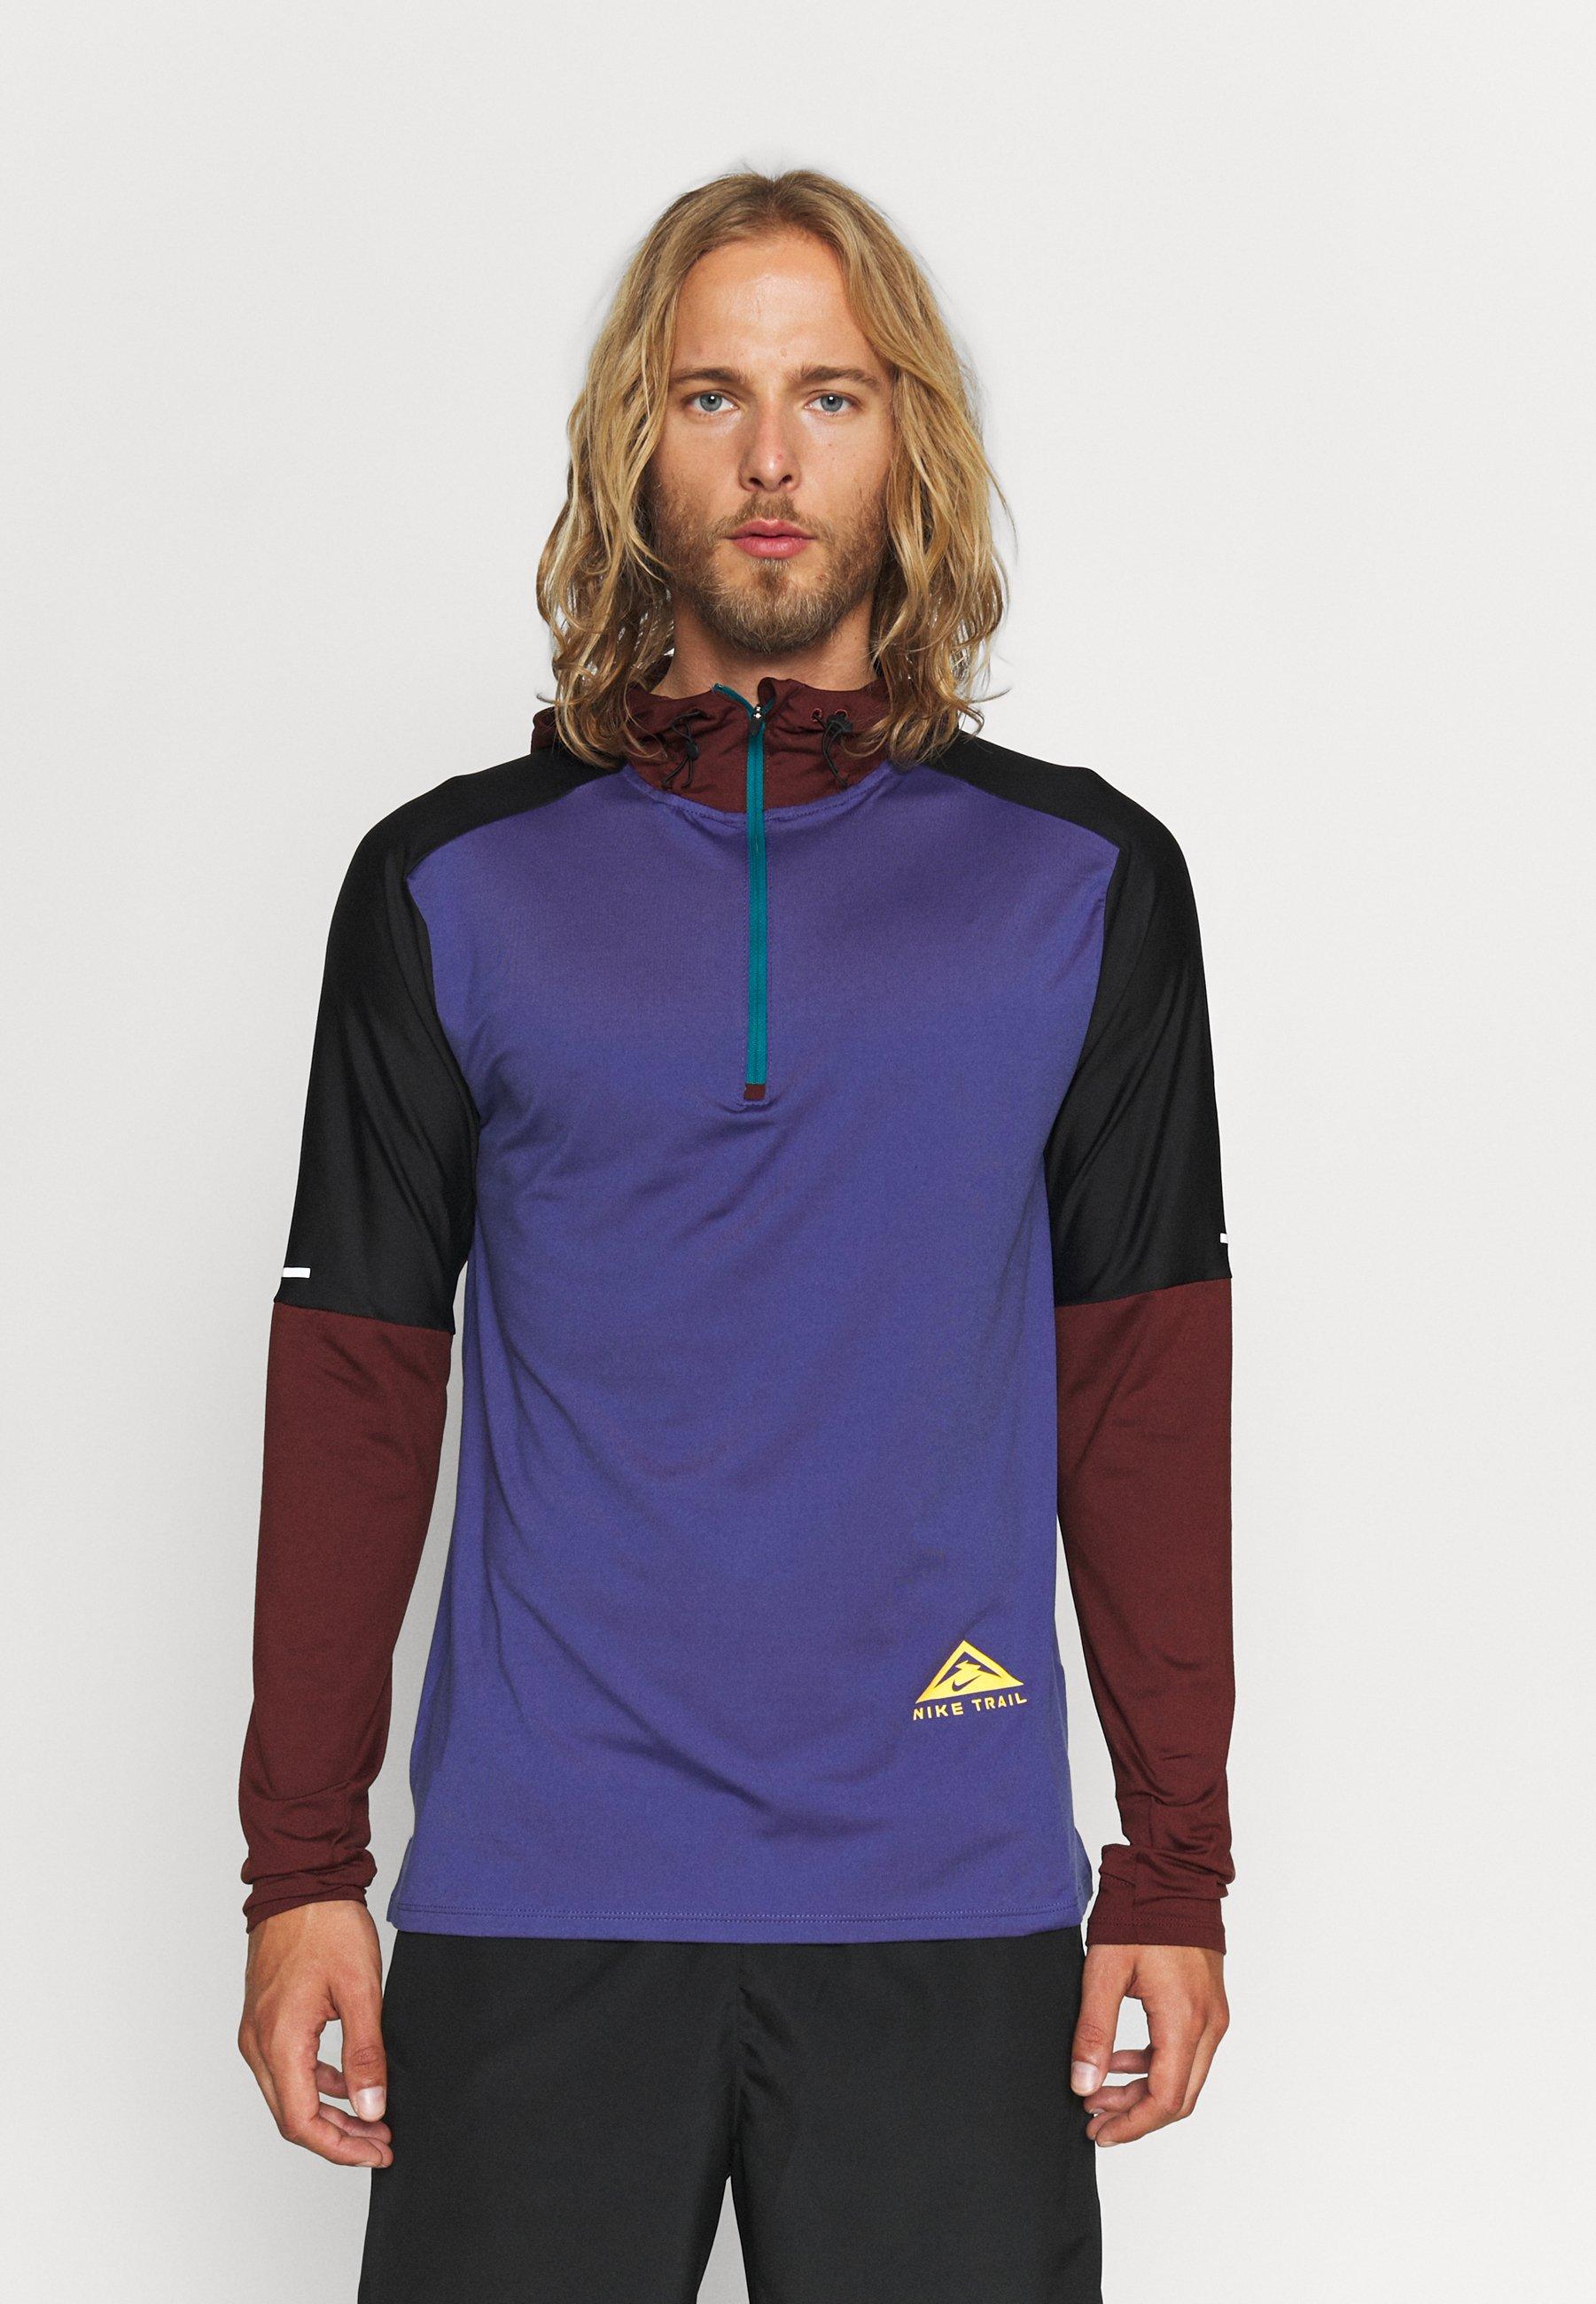 Uomo TRAIL HOODIE - T-shirt sportiva